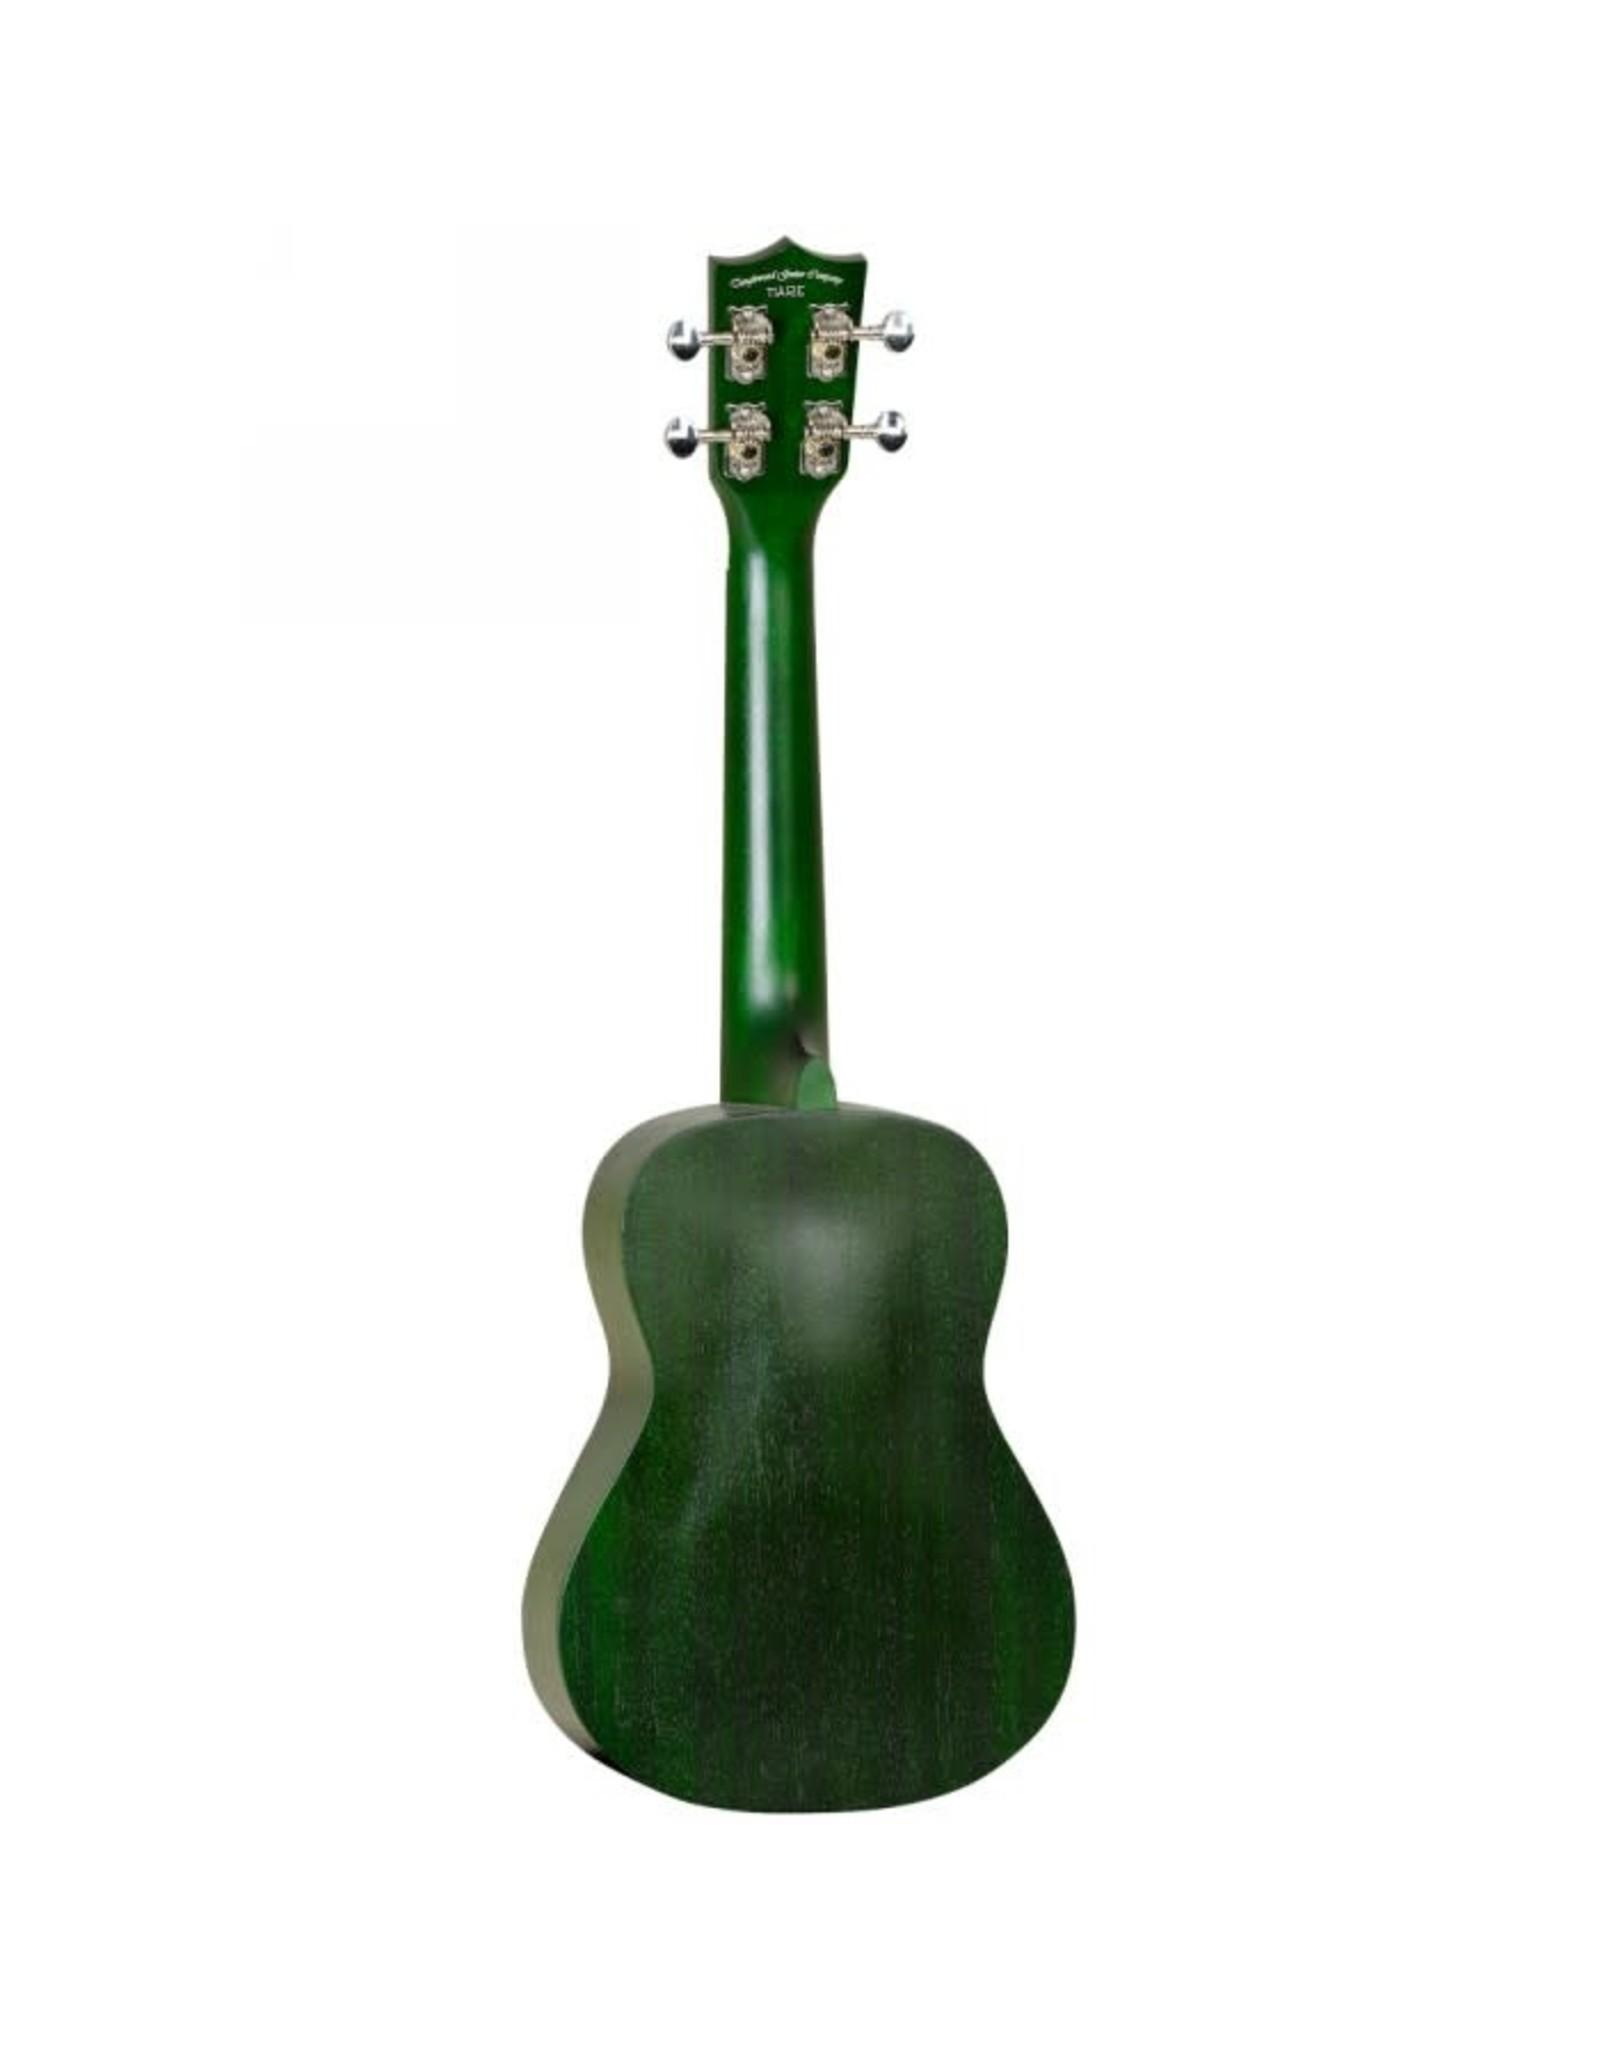 Tanglewood Tanglewood ukelele forrest green